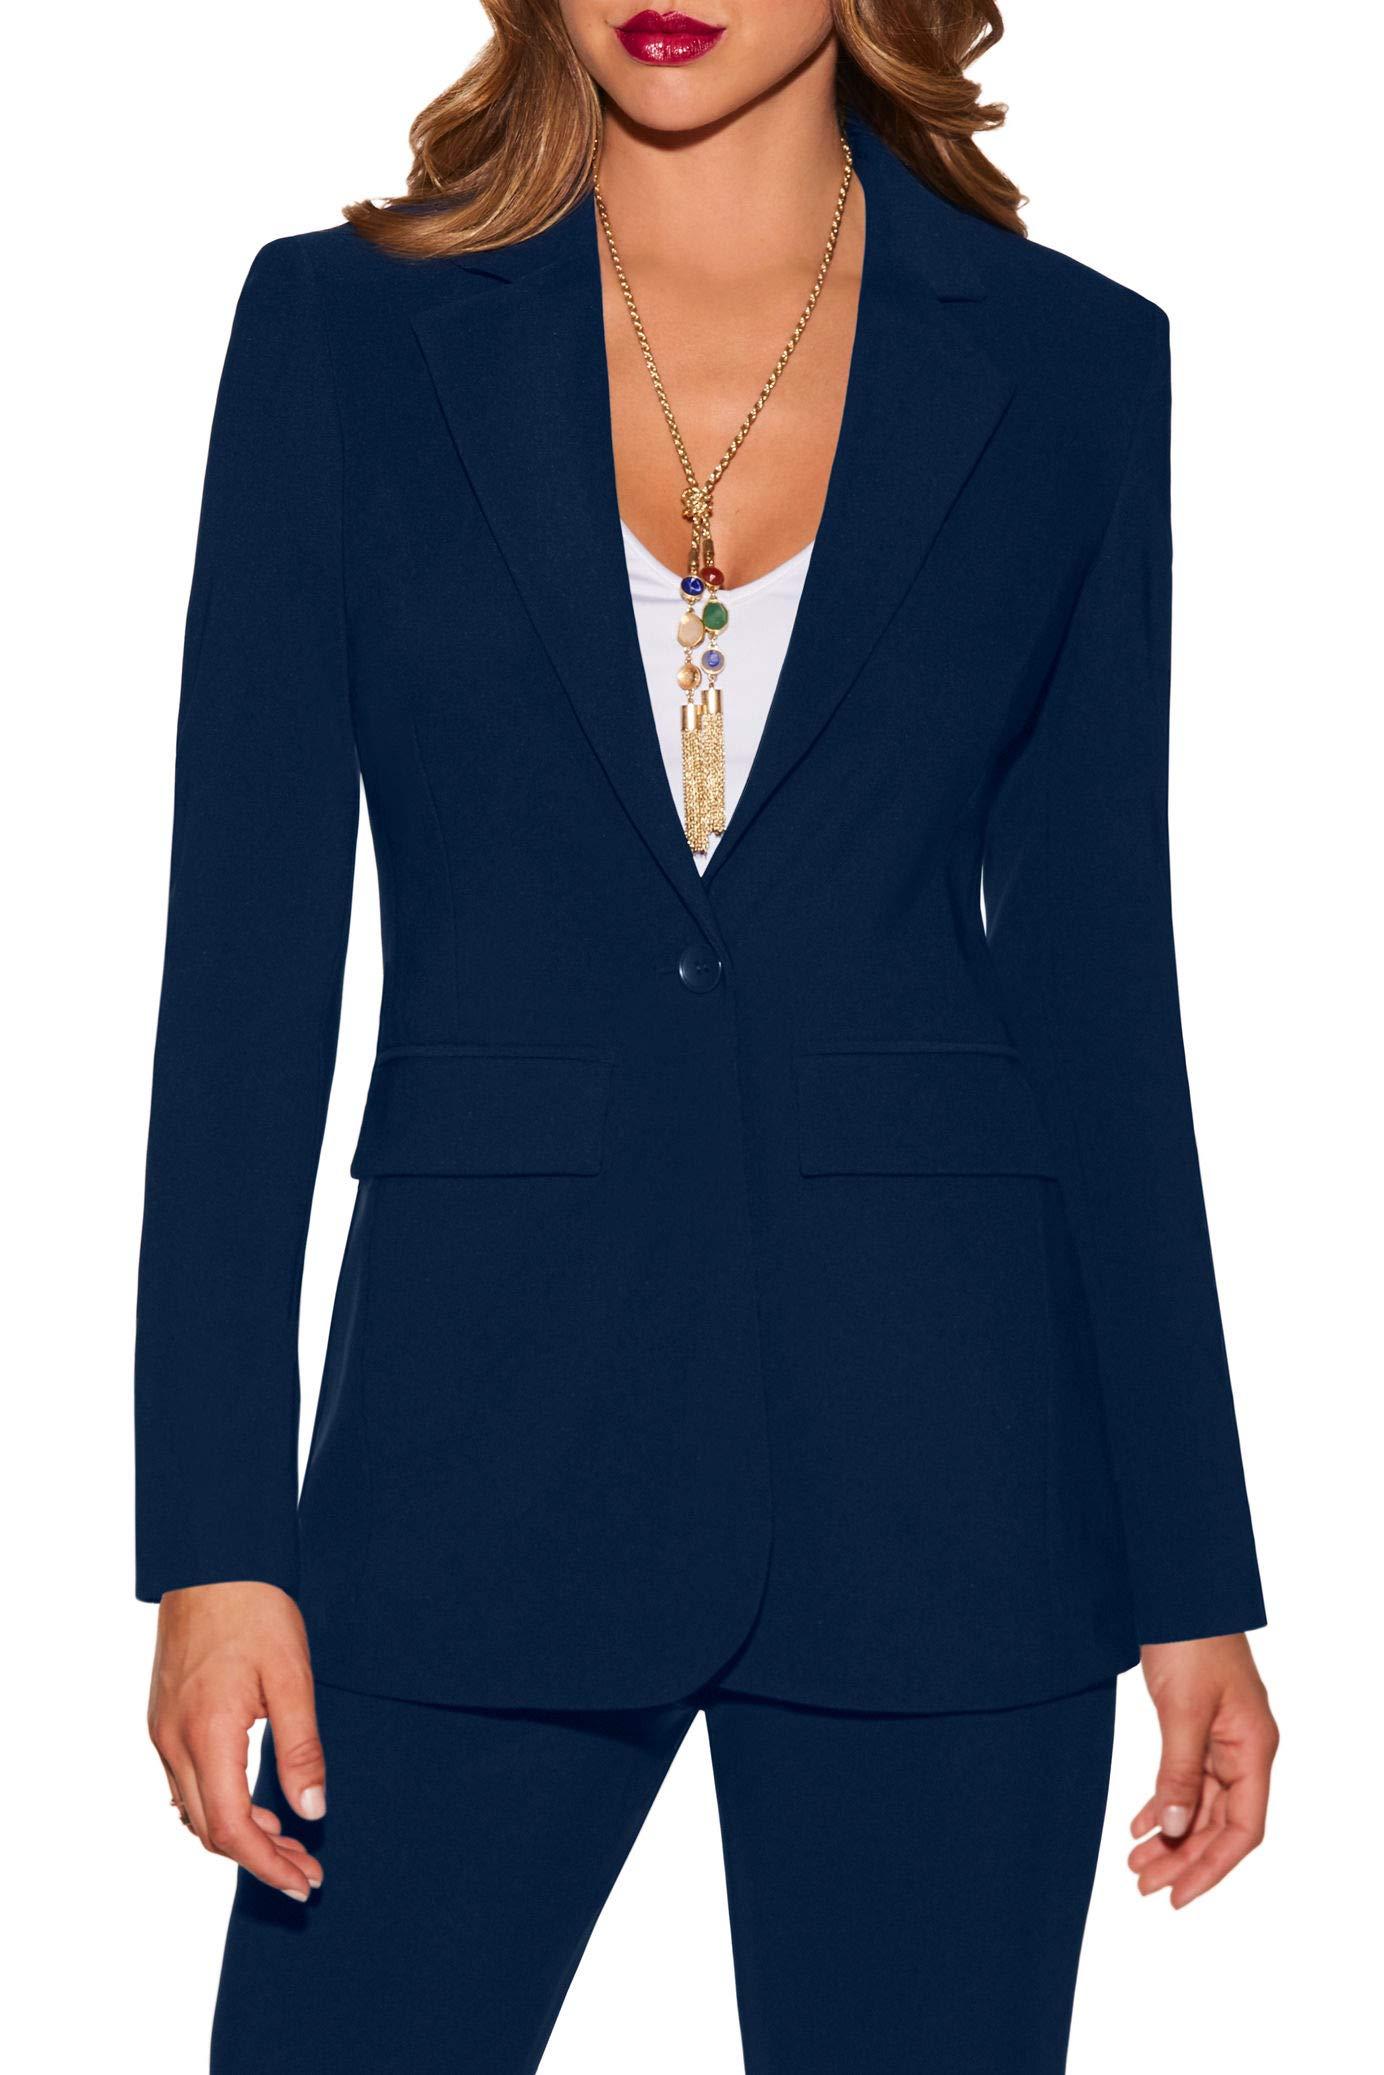 Boston Proper - Beyond Travel - Women's One Button Knit Boyfriend Blazer - Jackets for Women- Buy Online in Pakistan at desertcart.pk. ProductId : 139303990.